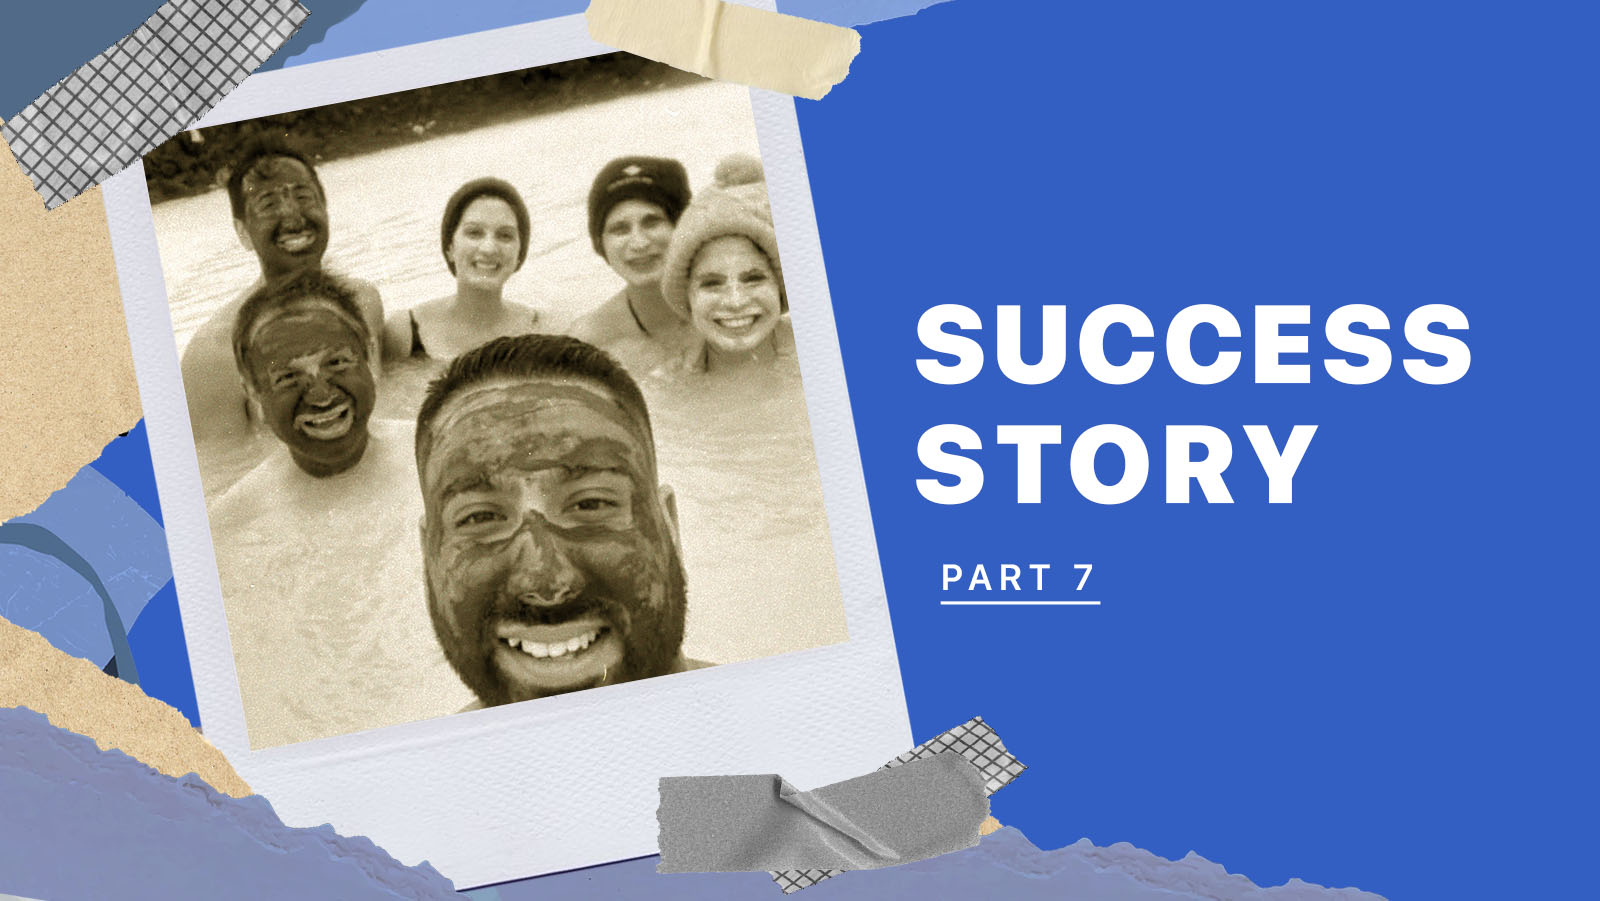 Imran's success story